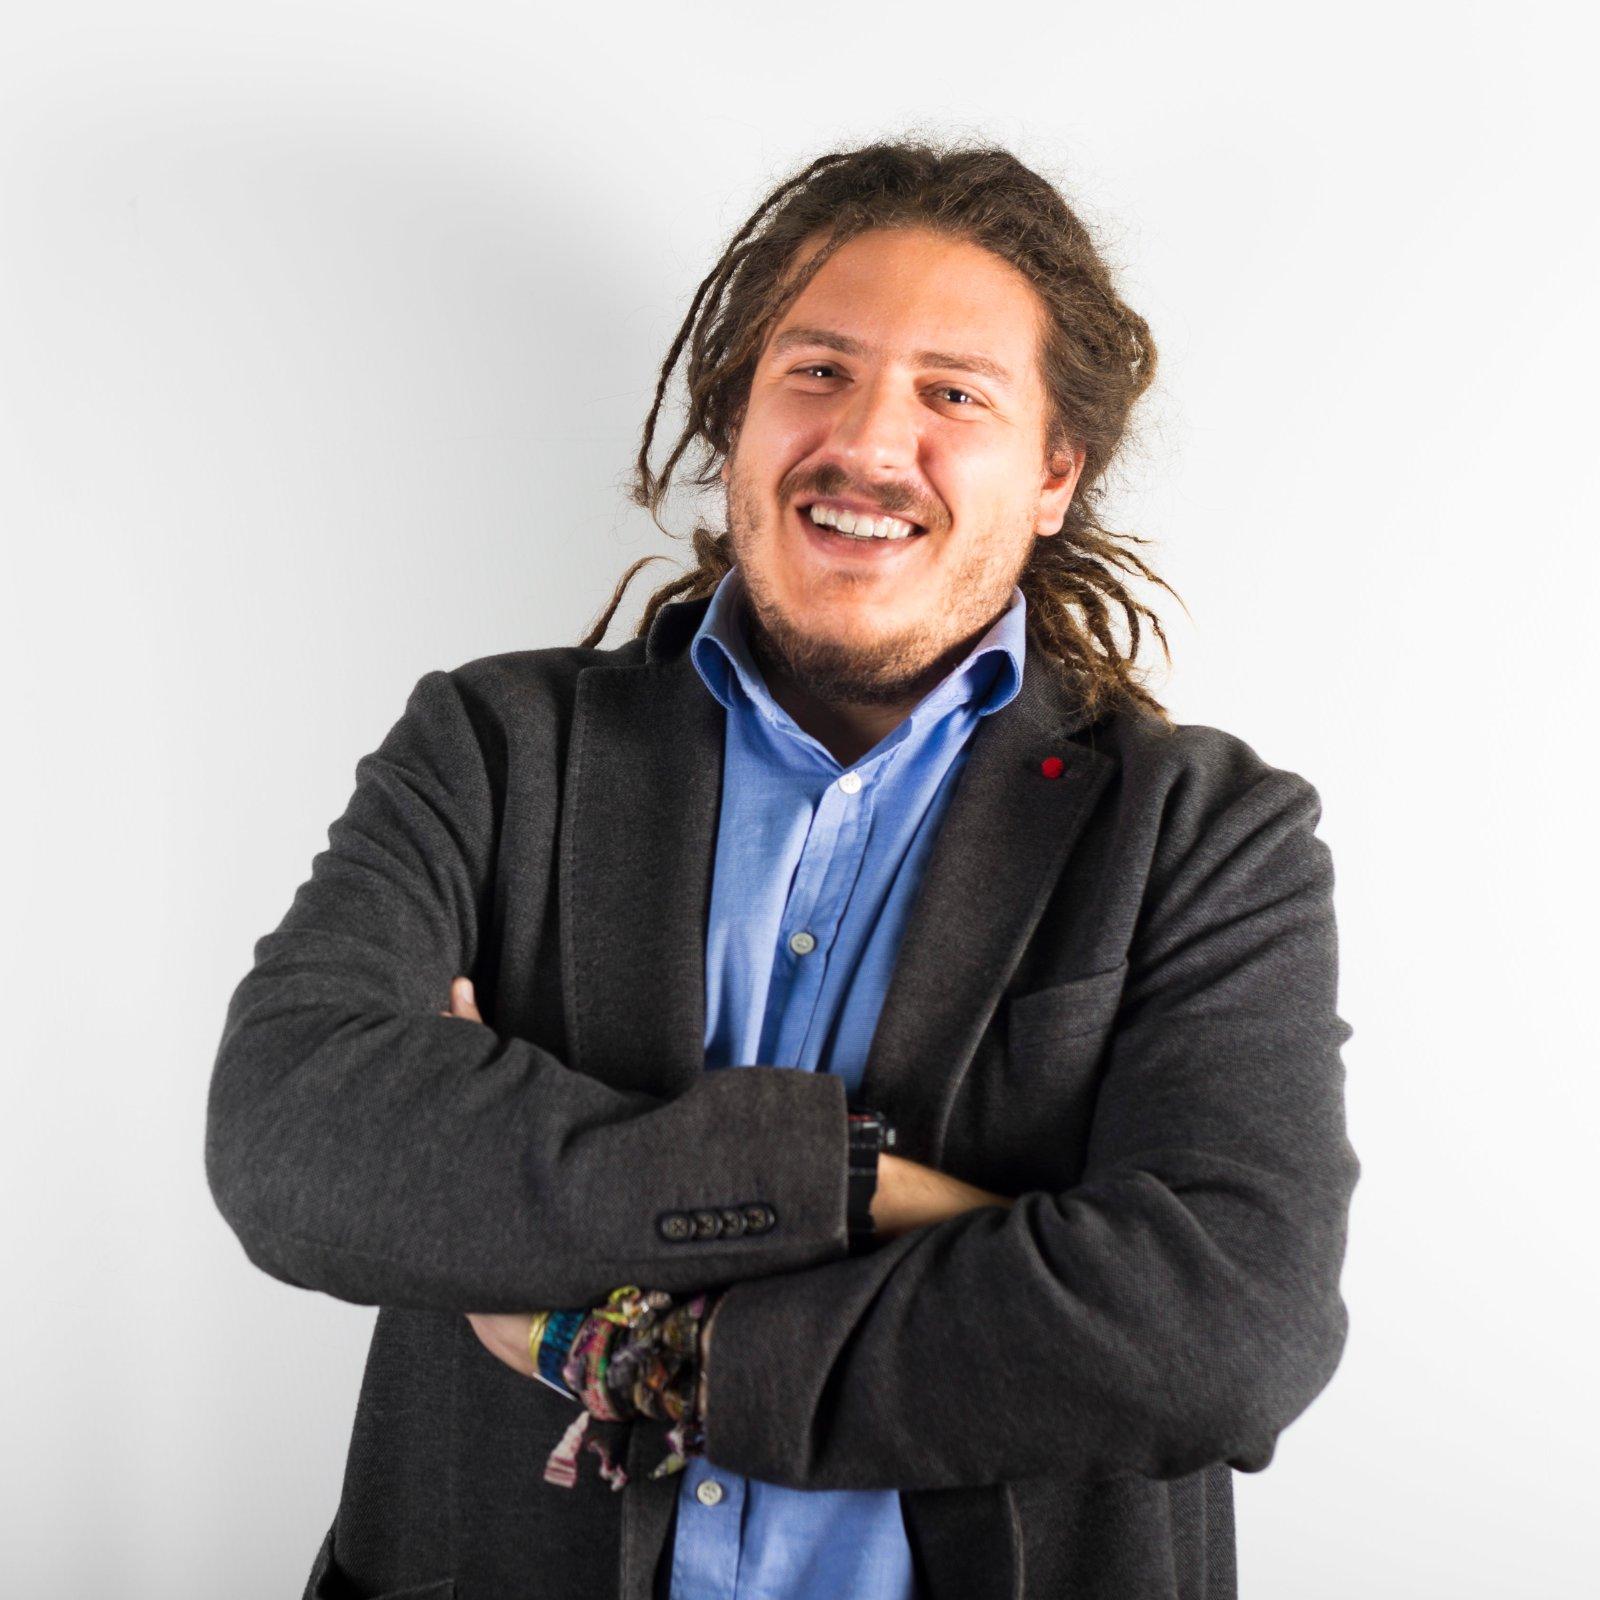 Luca Jacopo Bardazzi